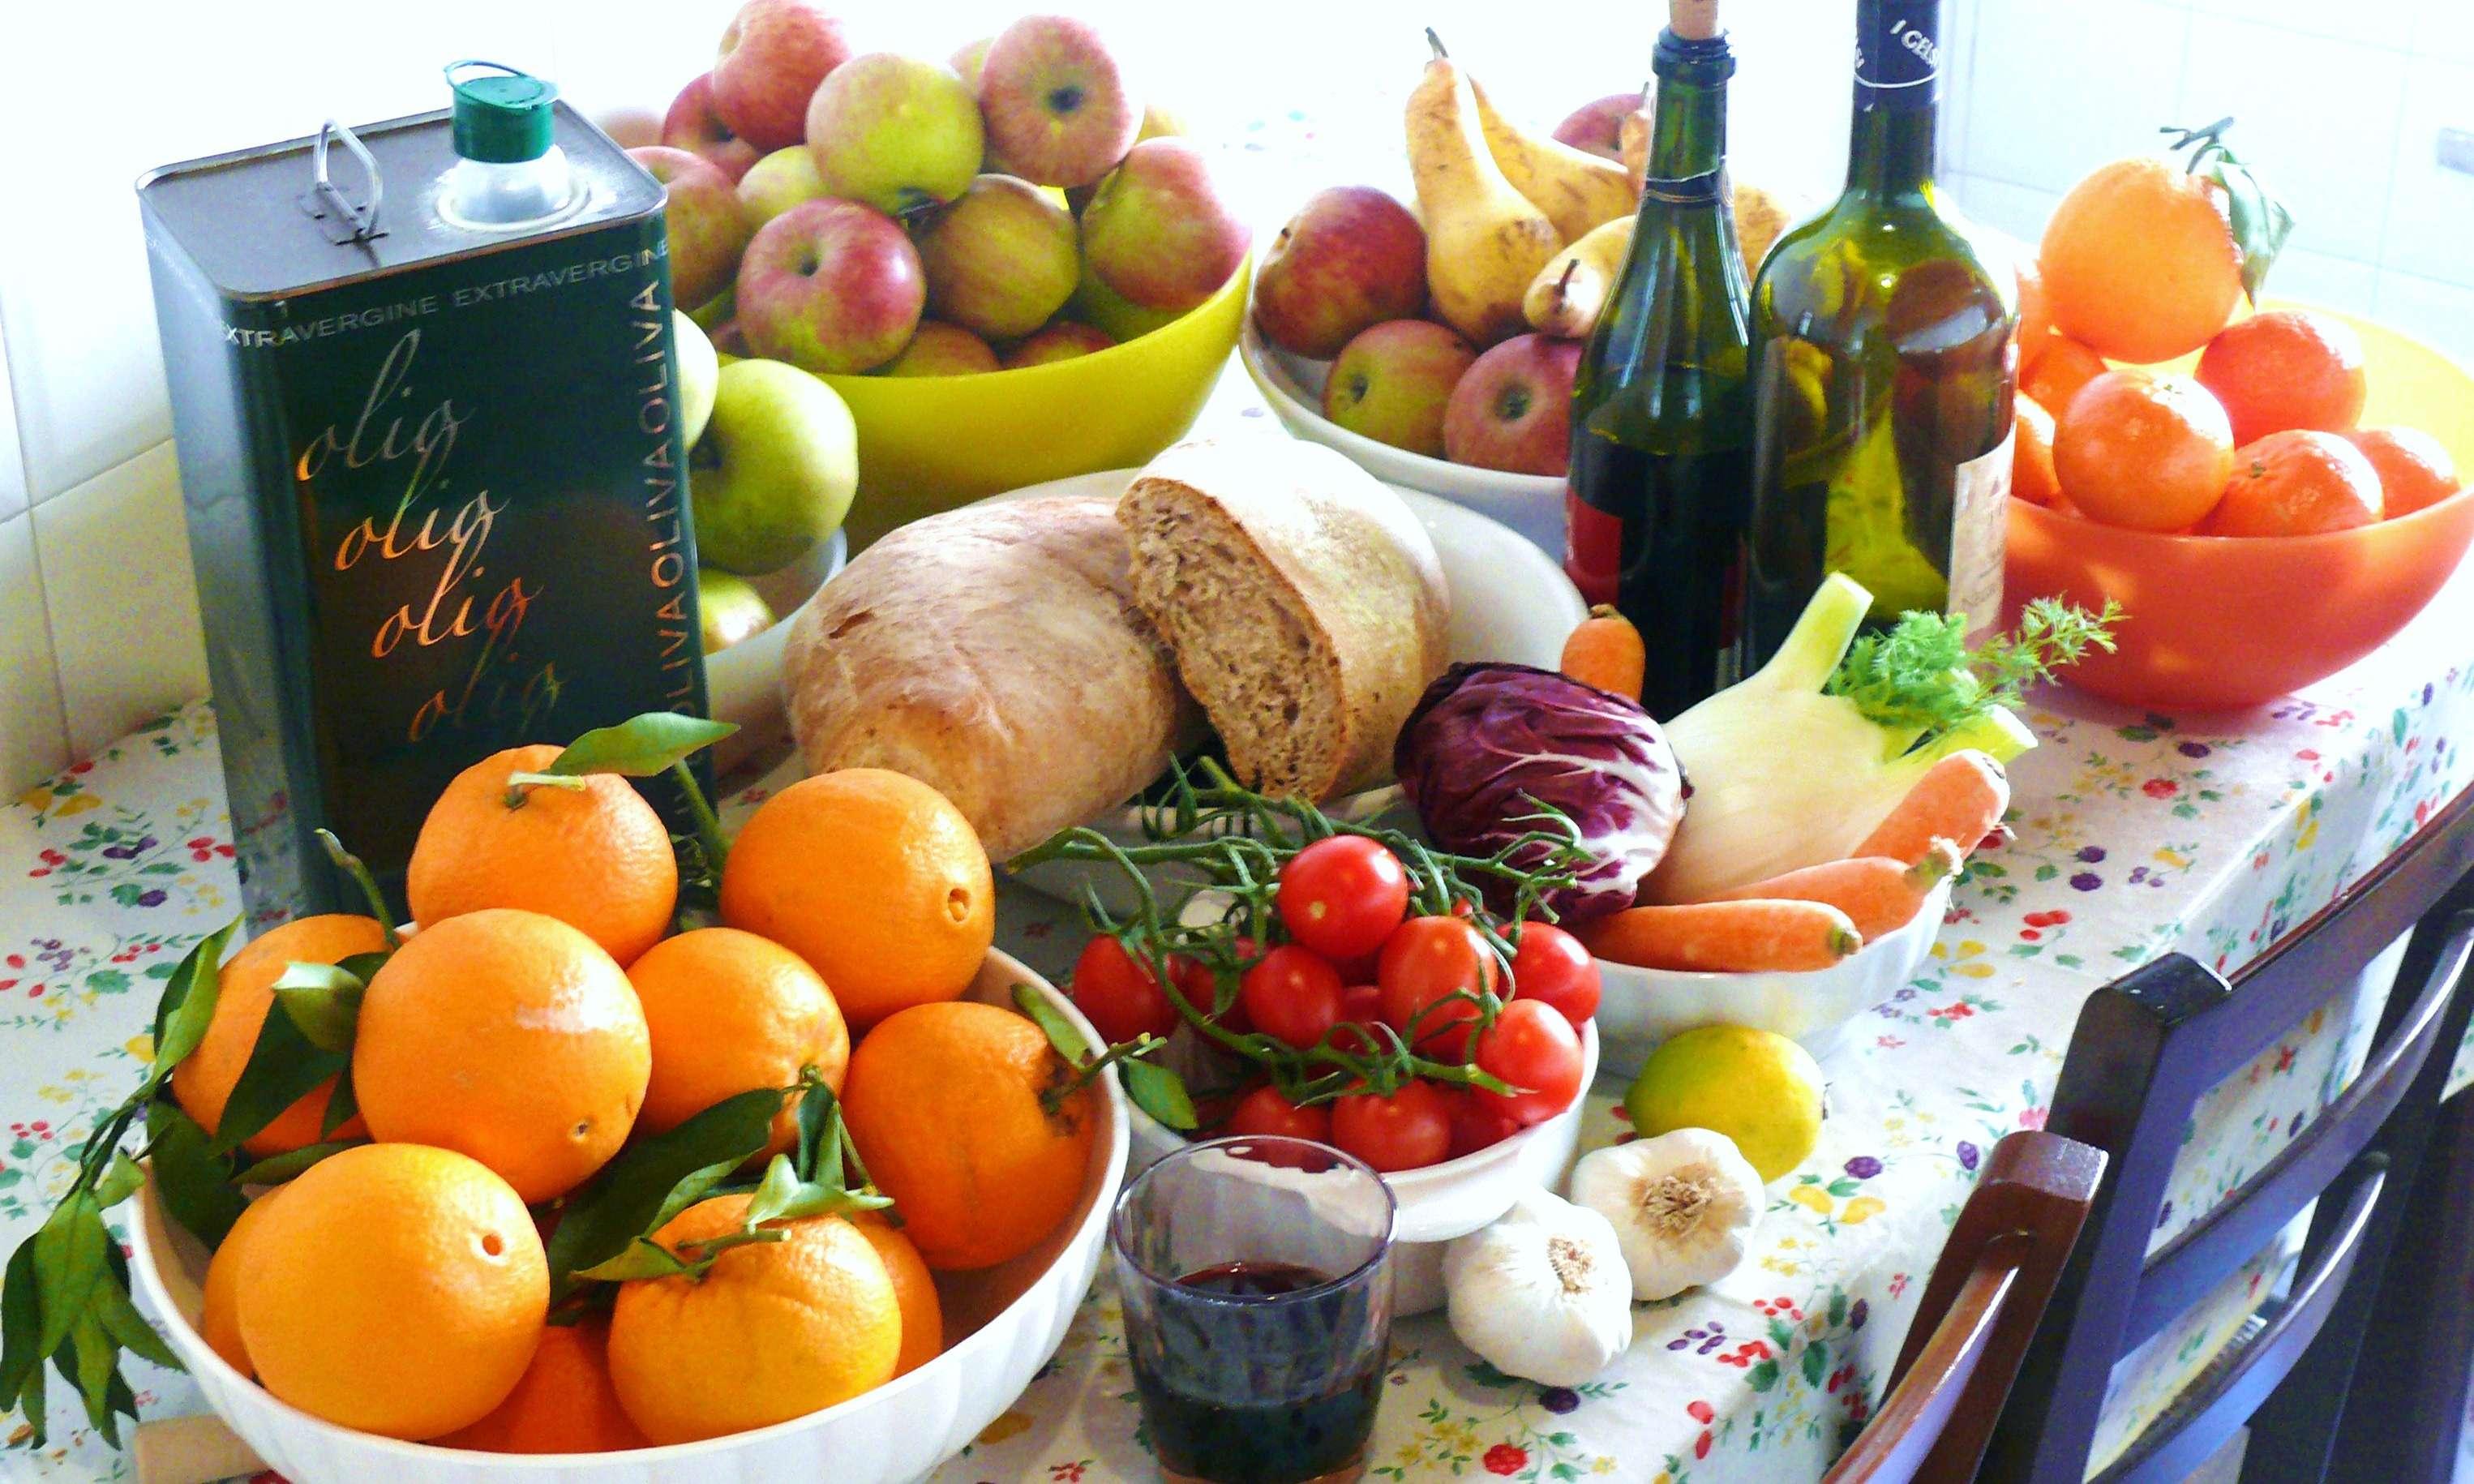 Quale alimento contiene l'acido etanoico?